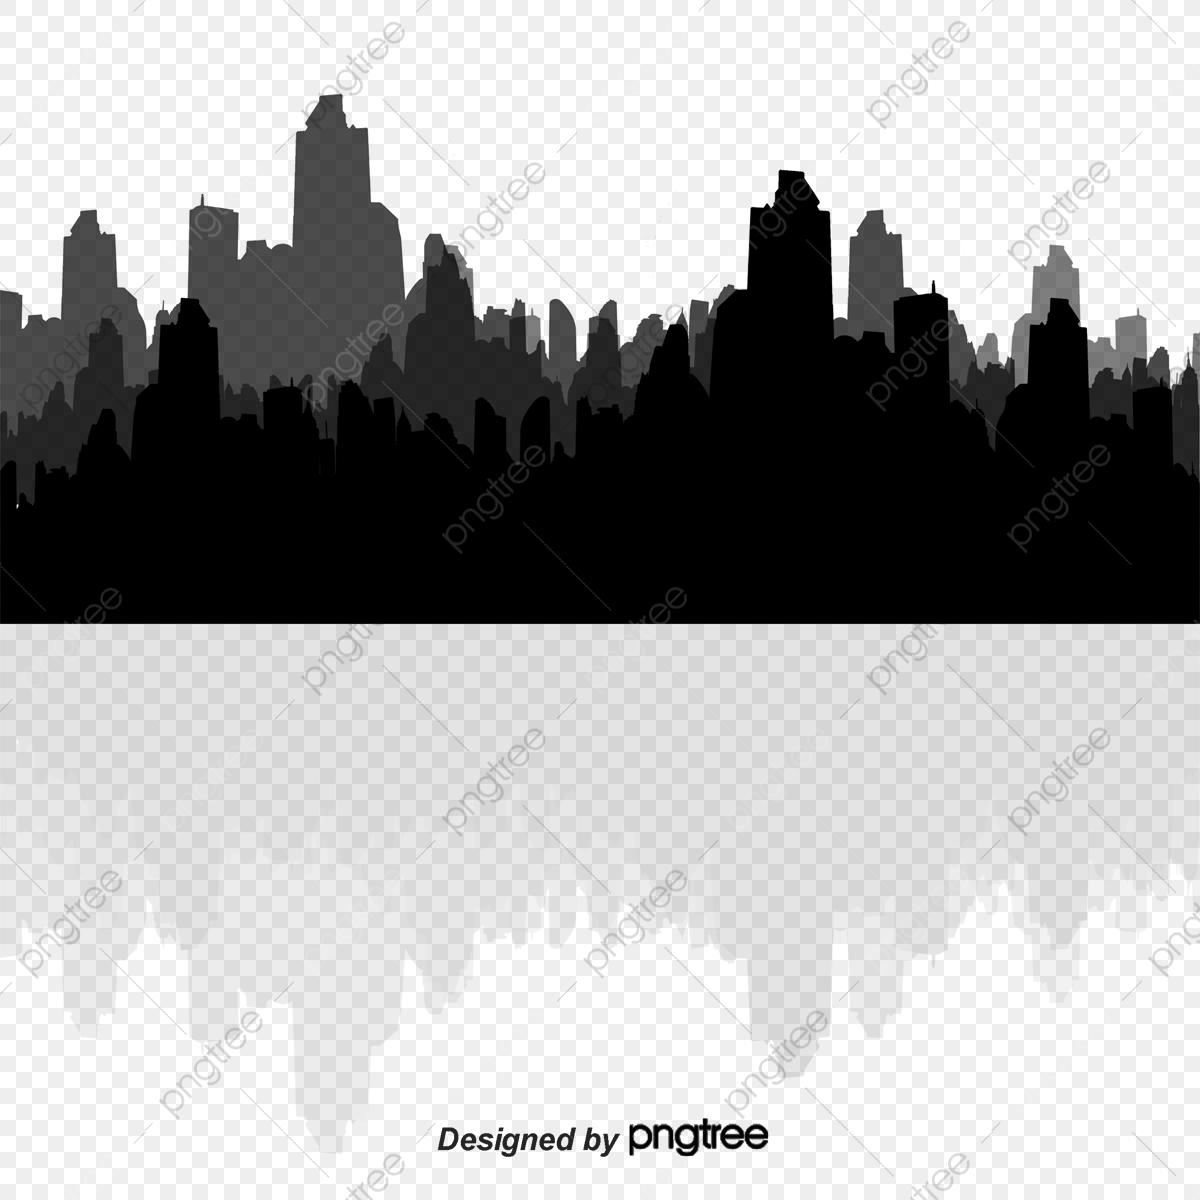 O Perfil De Cidade, O Perfil De Cidade, Elementos De Contorno.